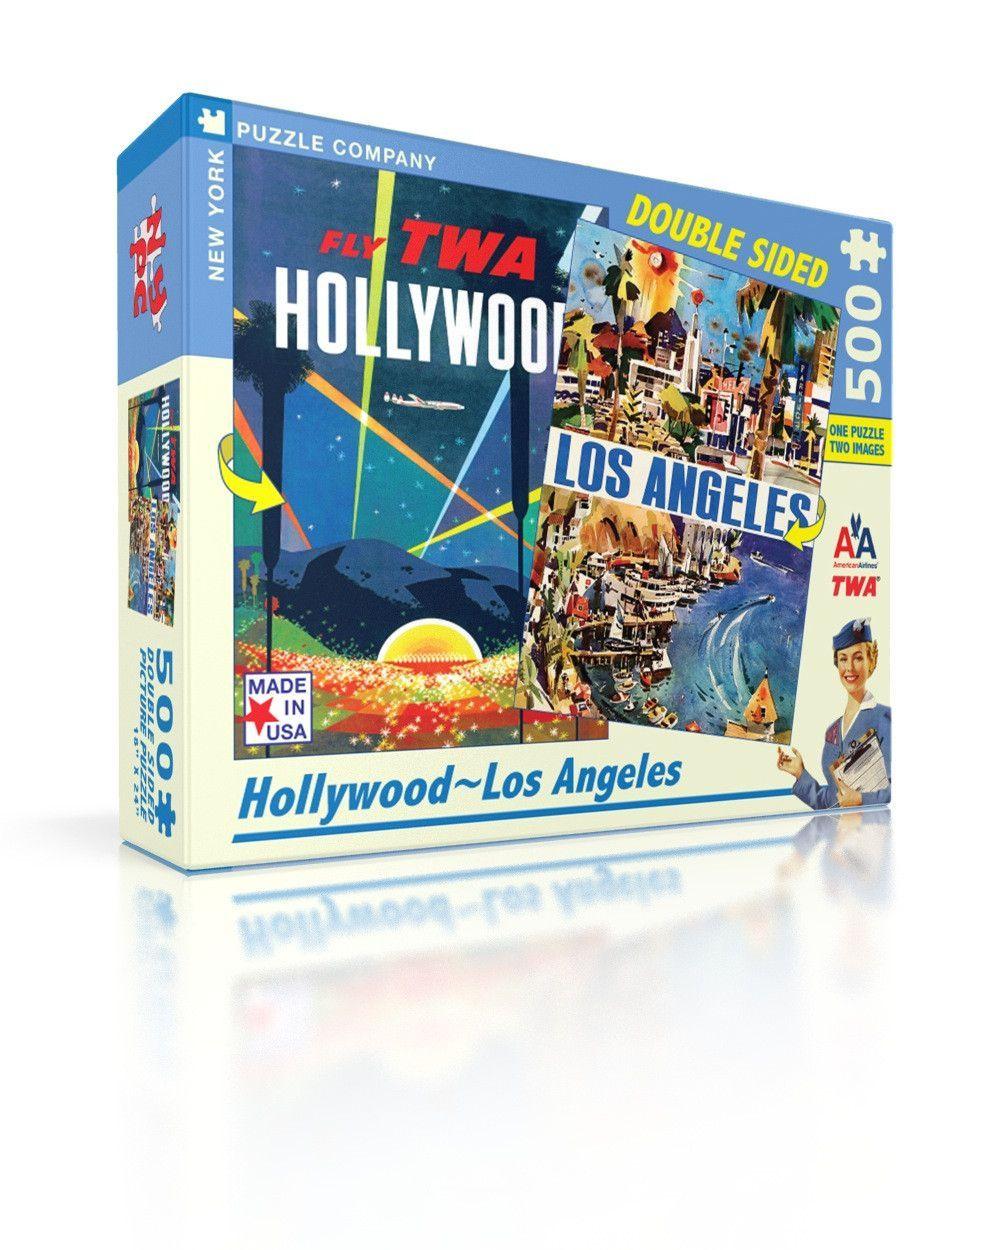 Hollywoodla vintage travel posters los angeles